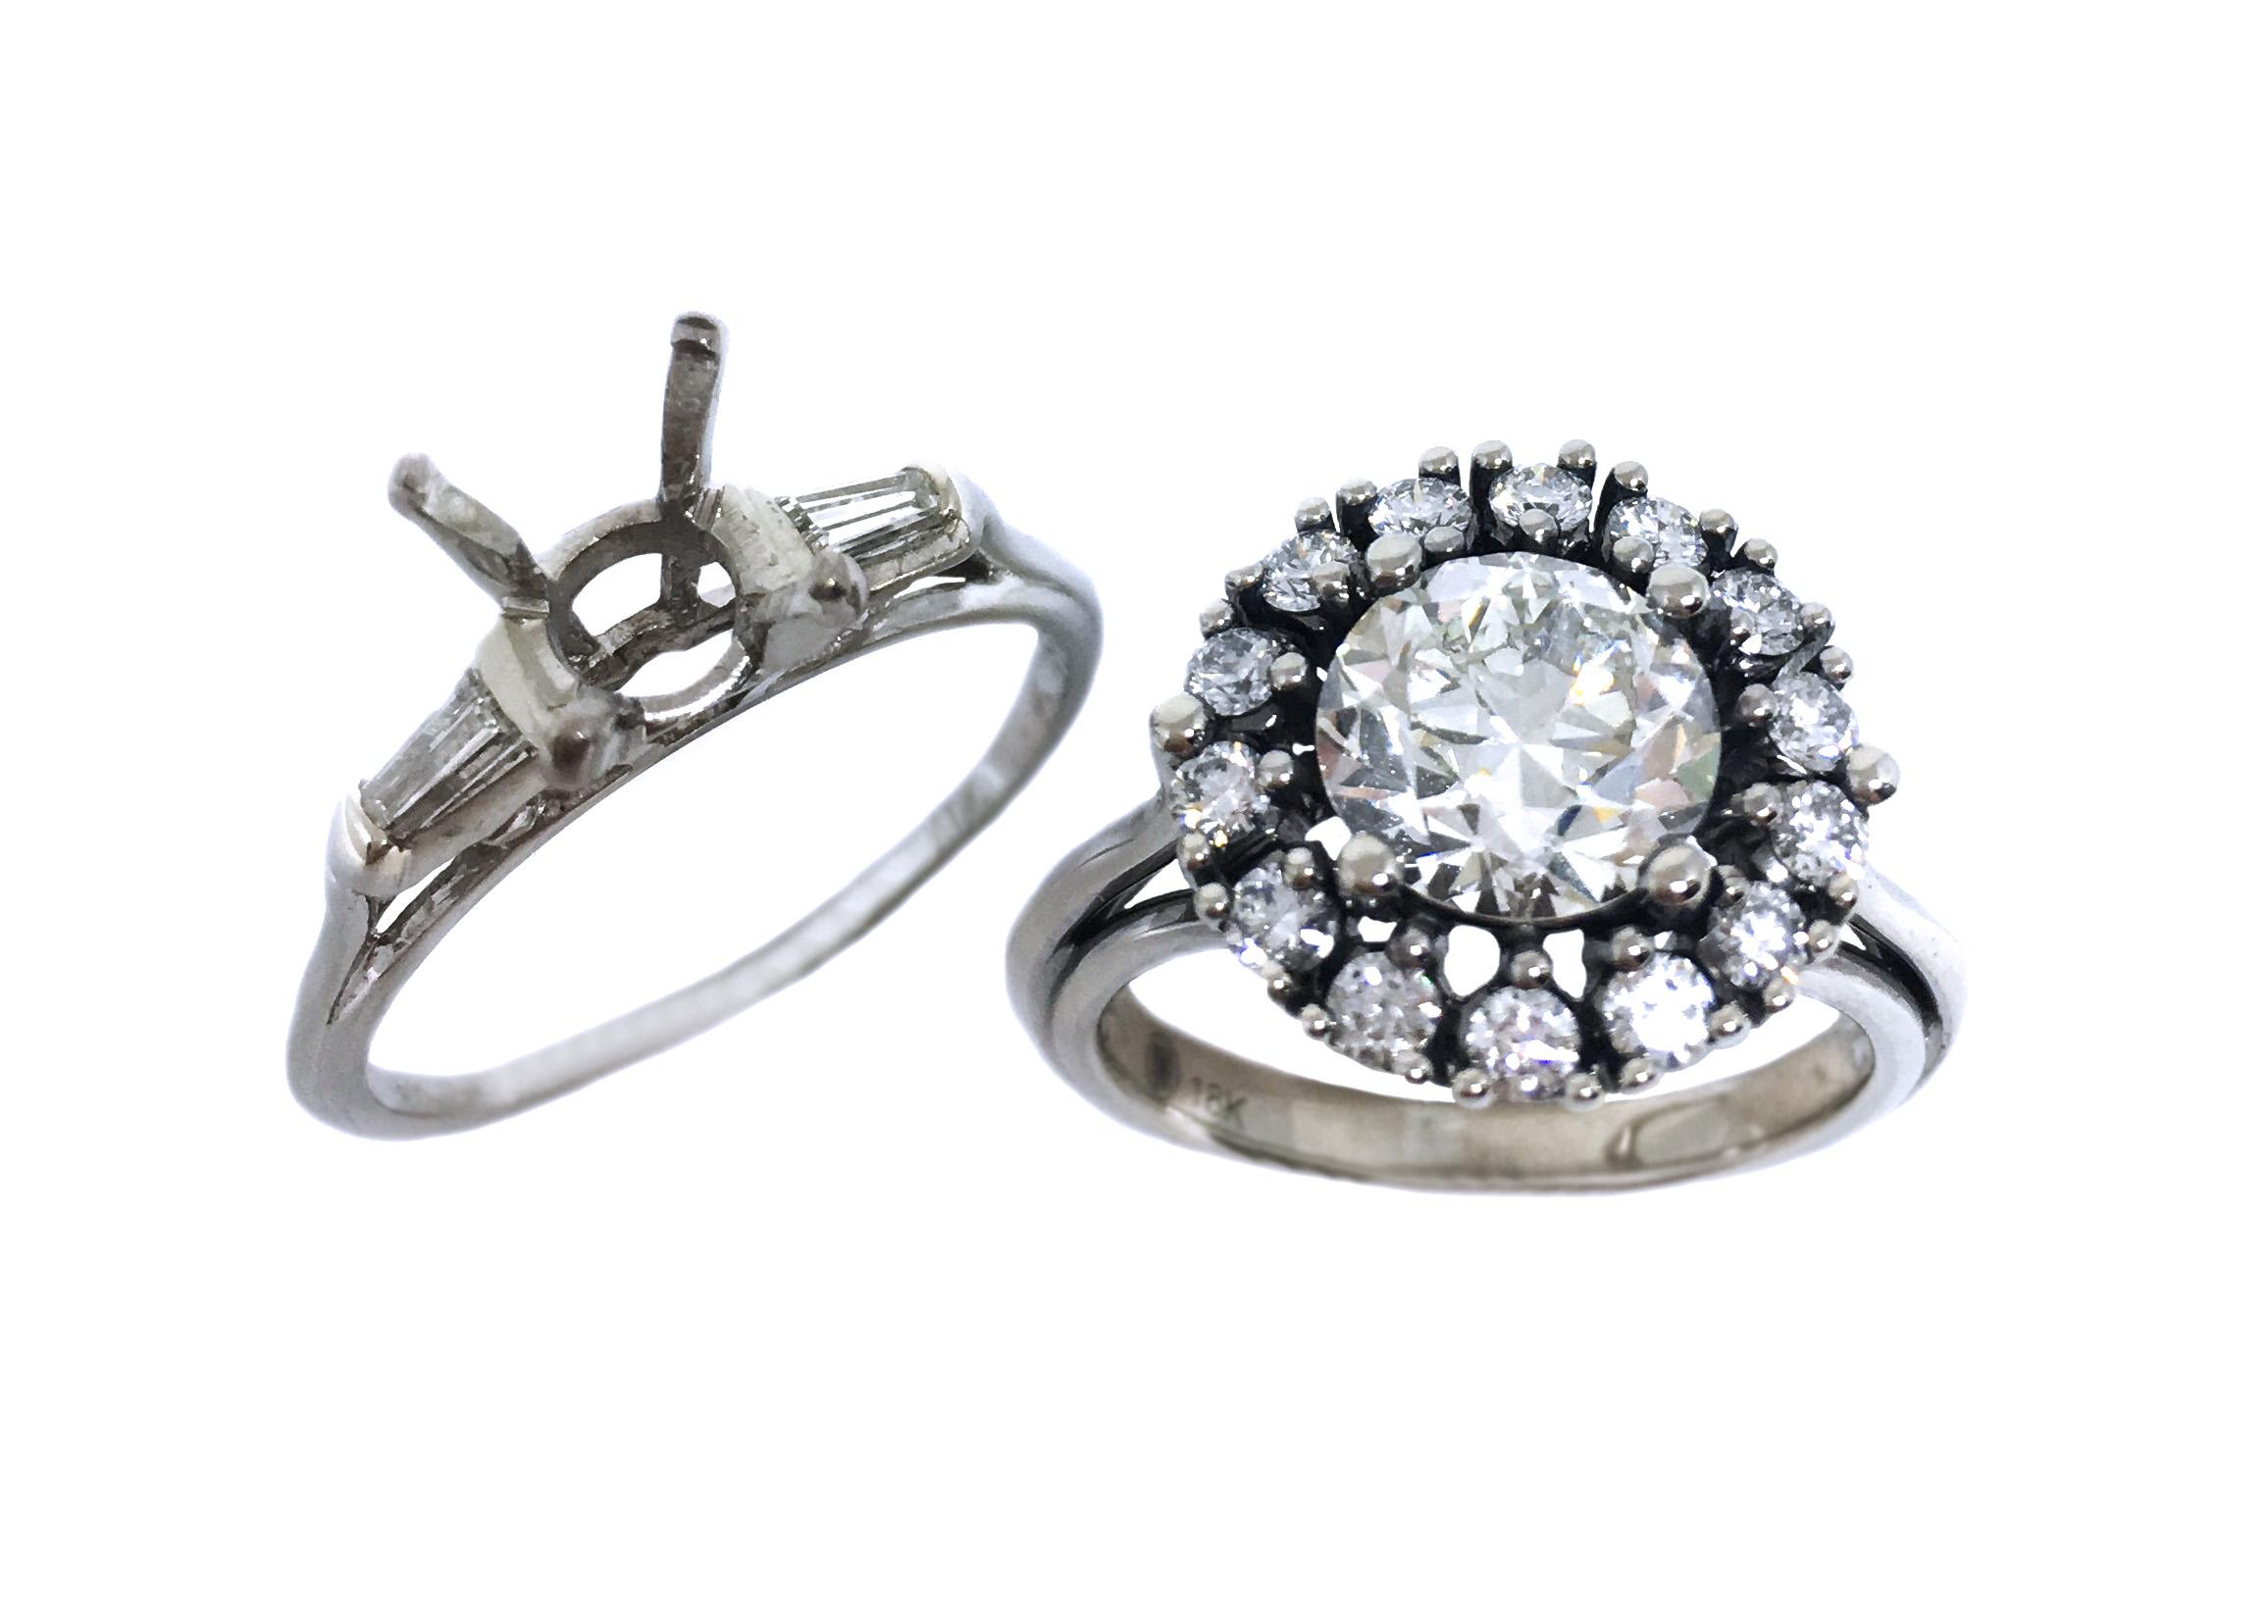 Custom Antique Reproduction Diamond Ring